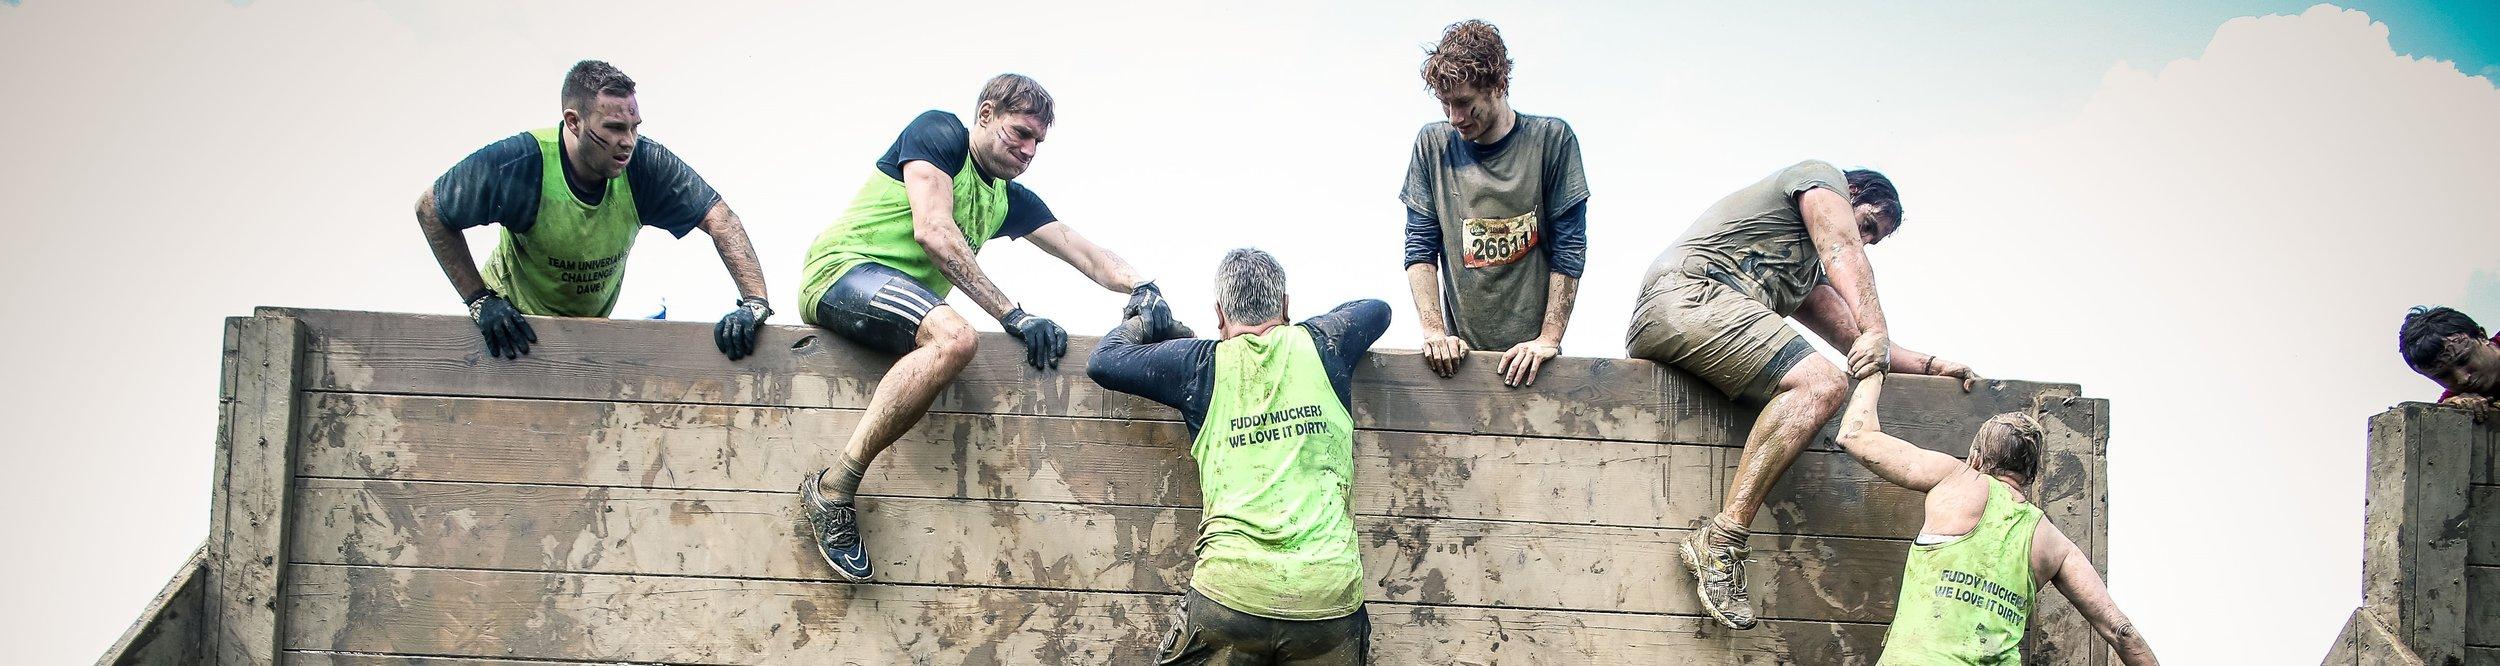 An obstacle at Tough Mudder